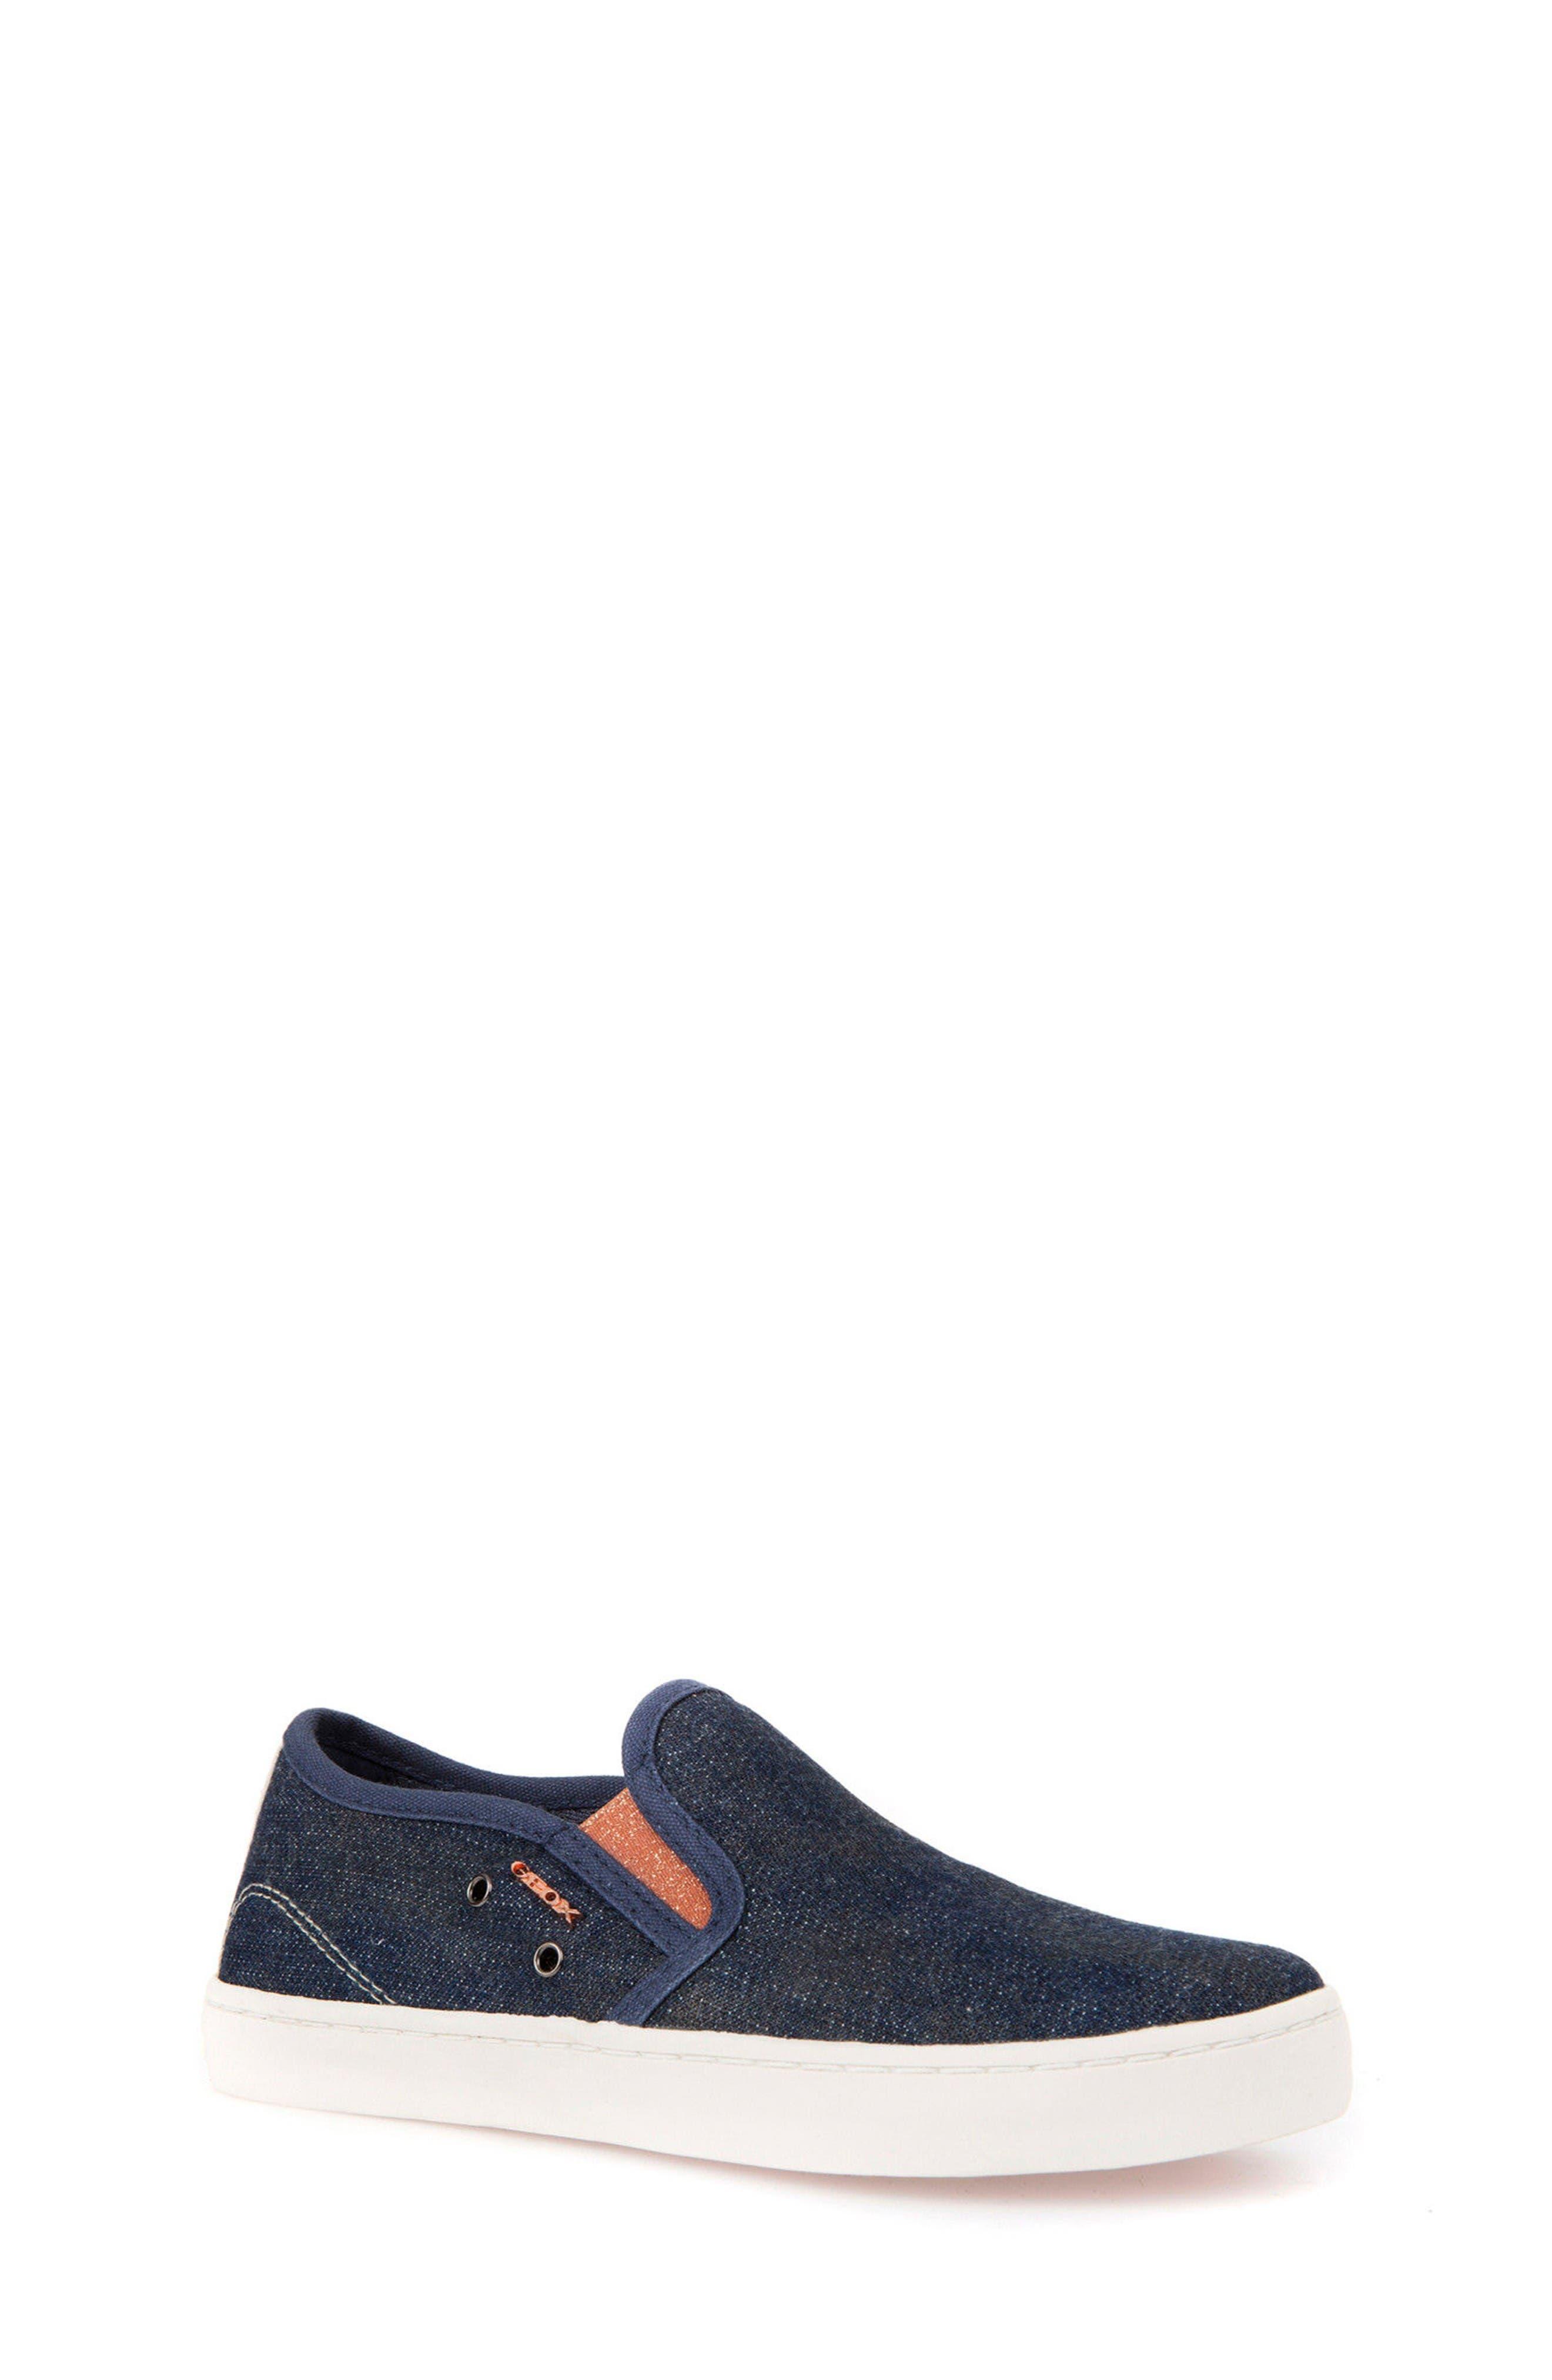 Geox Jr Kiwi Slip-On Sneaker (Toddler, Little Kid & Big Kid)